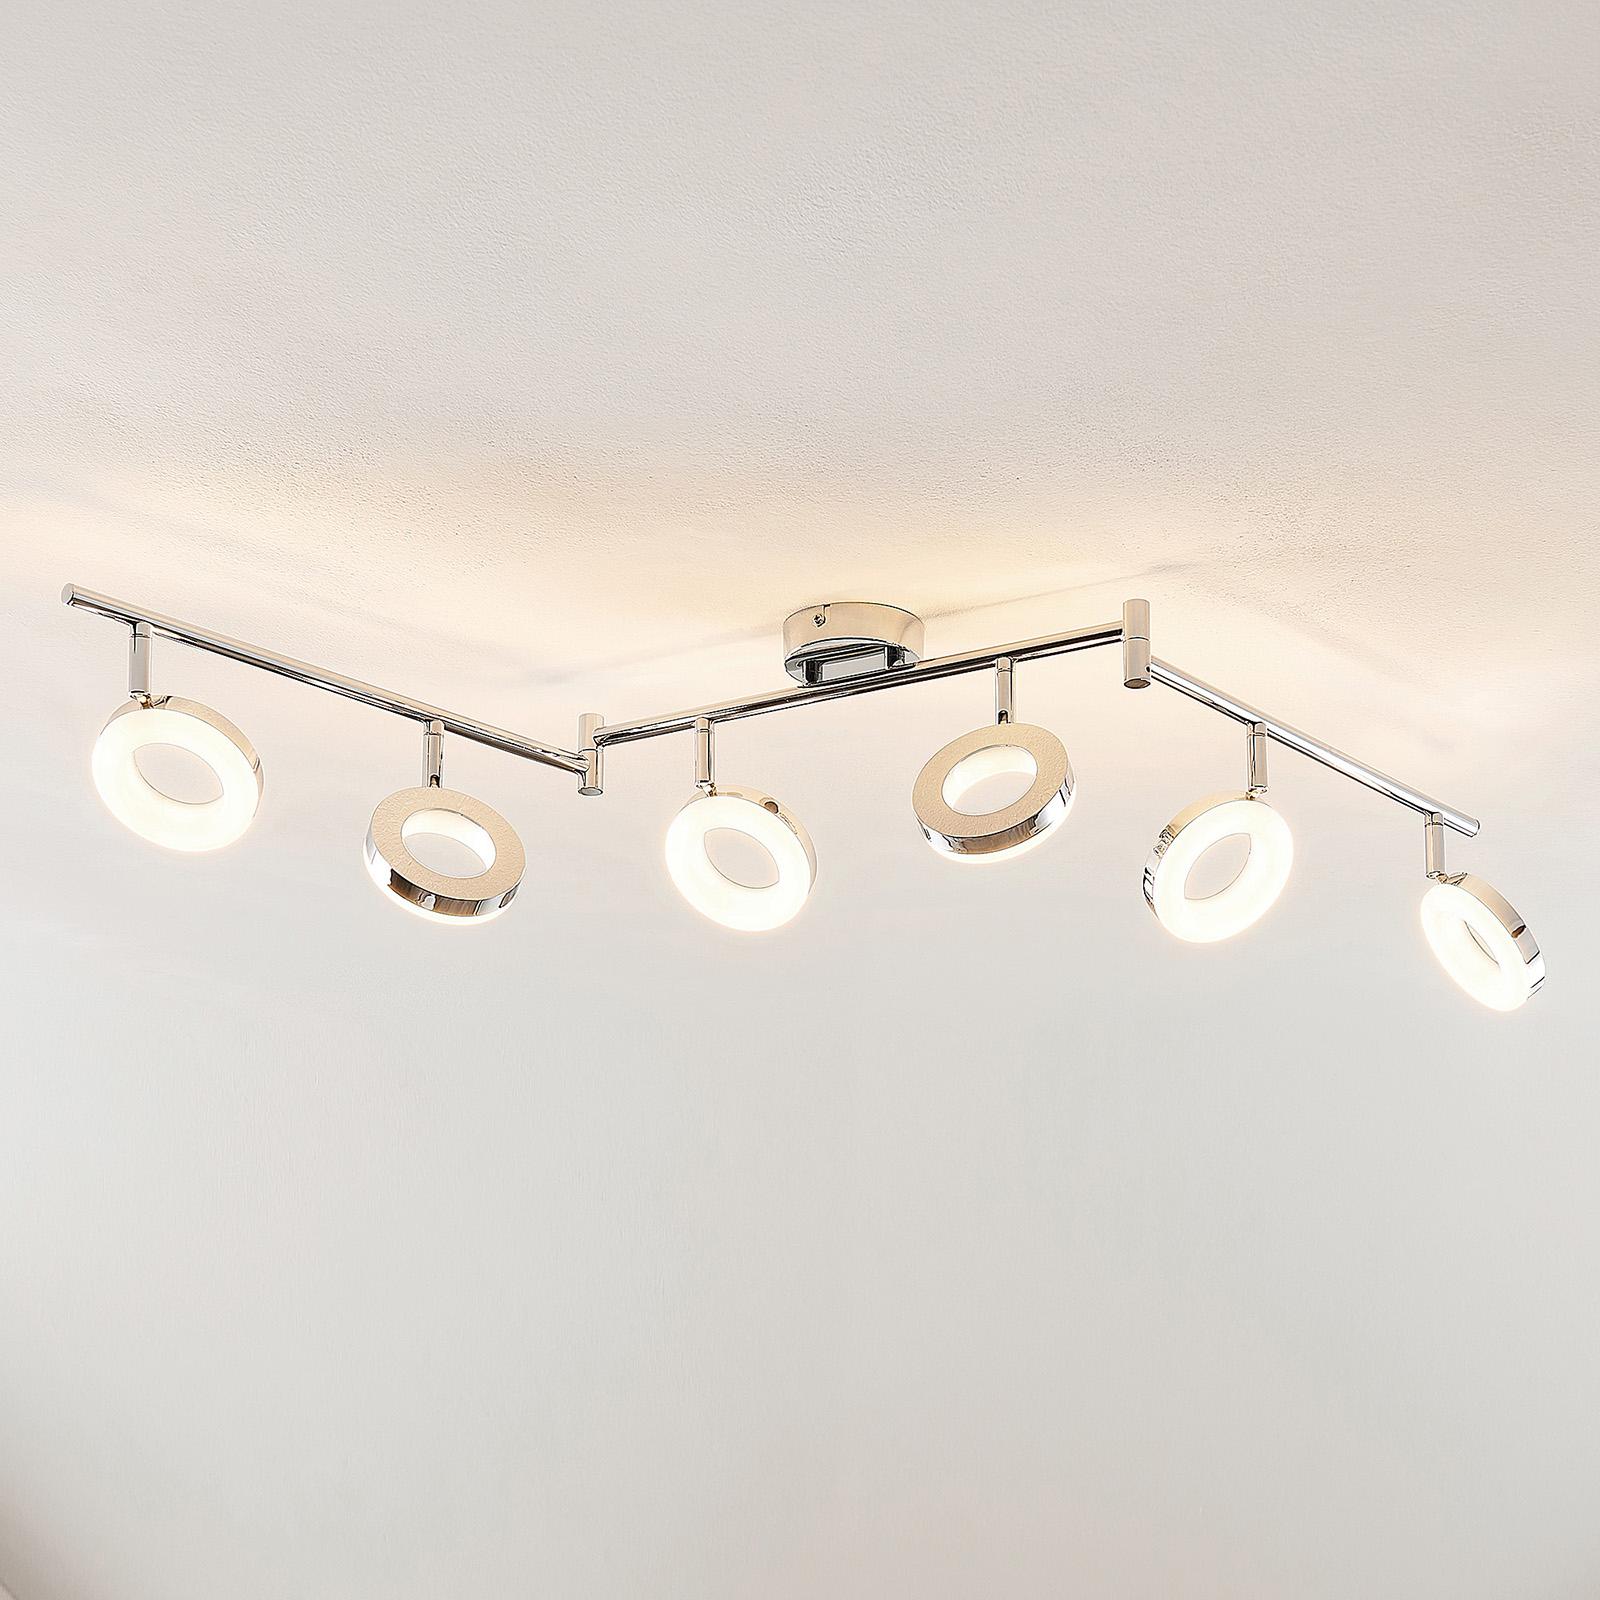 ELC Tioklia LED-taklampa, krom, 6 lampor